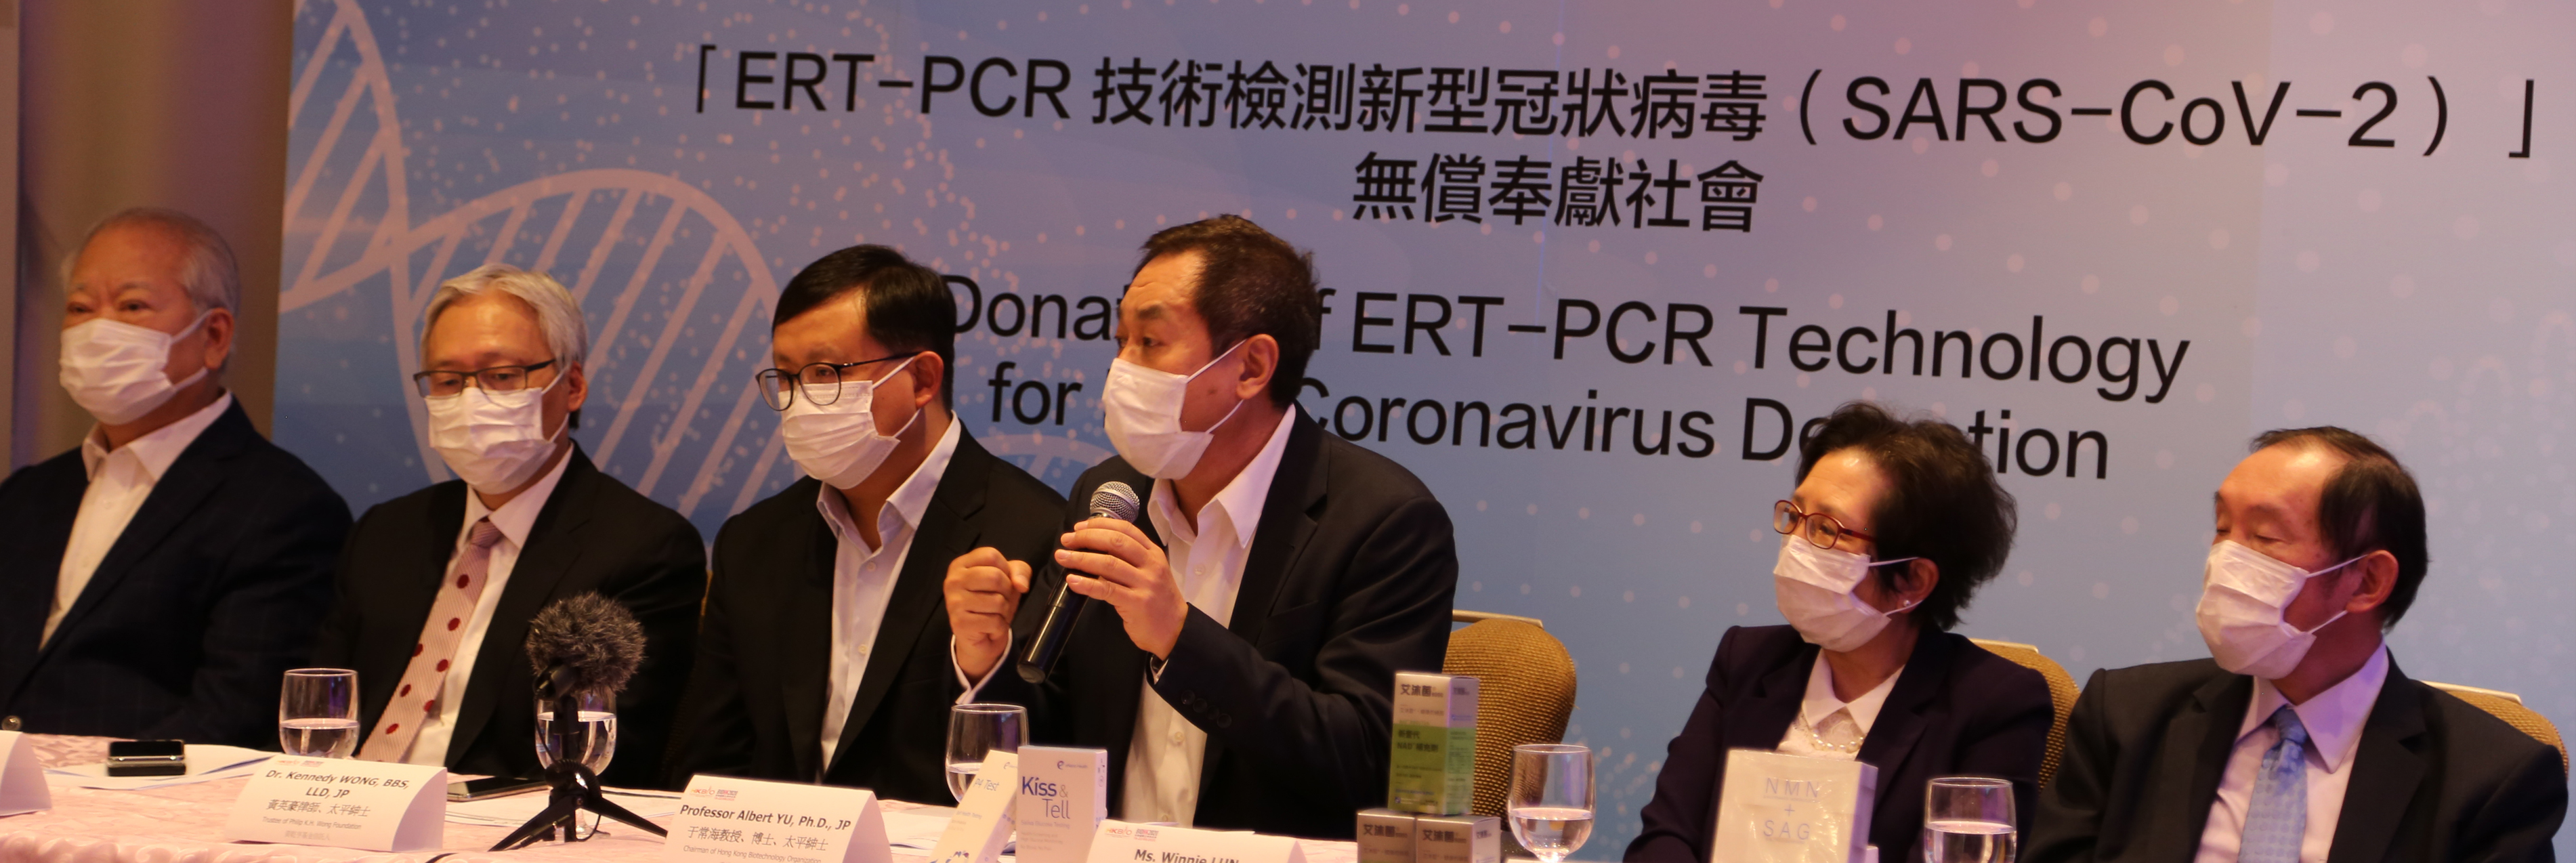 「ERT-PCR技術檢測新型冠狀病毒(SARS-CoV-2)」無償奉獻社會新聞發佈會